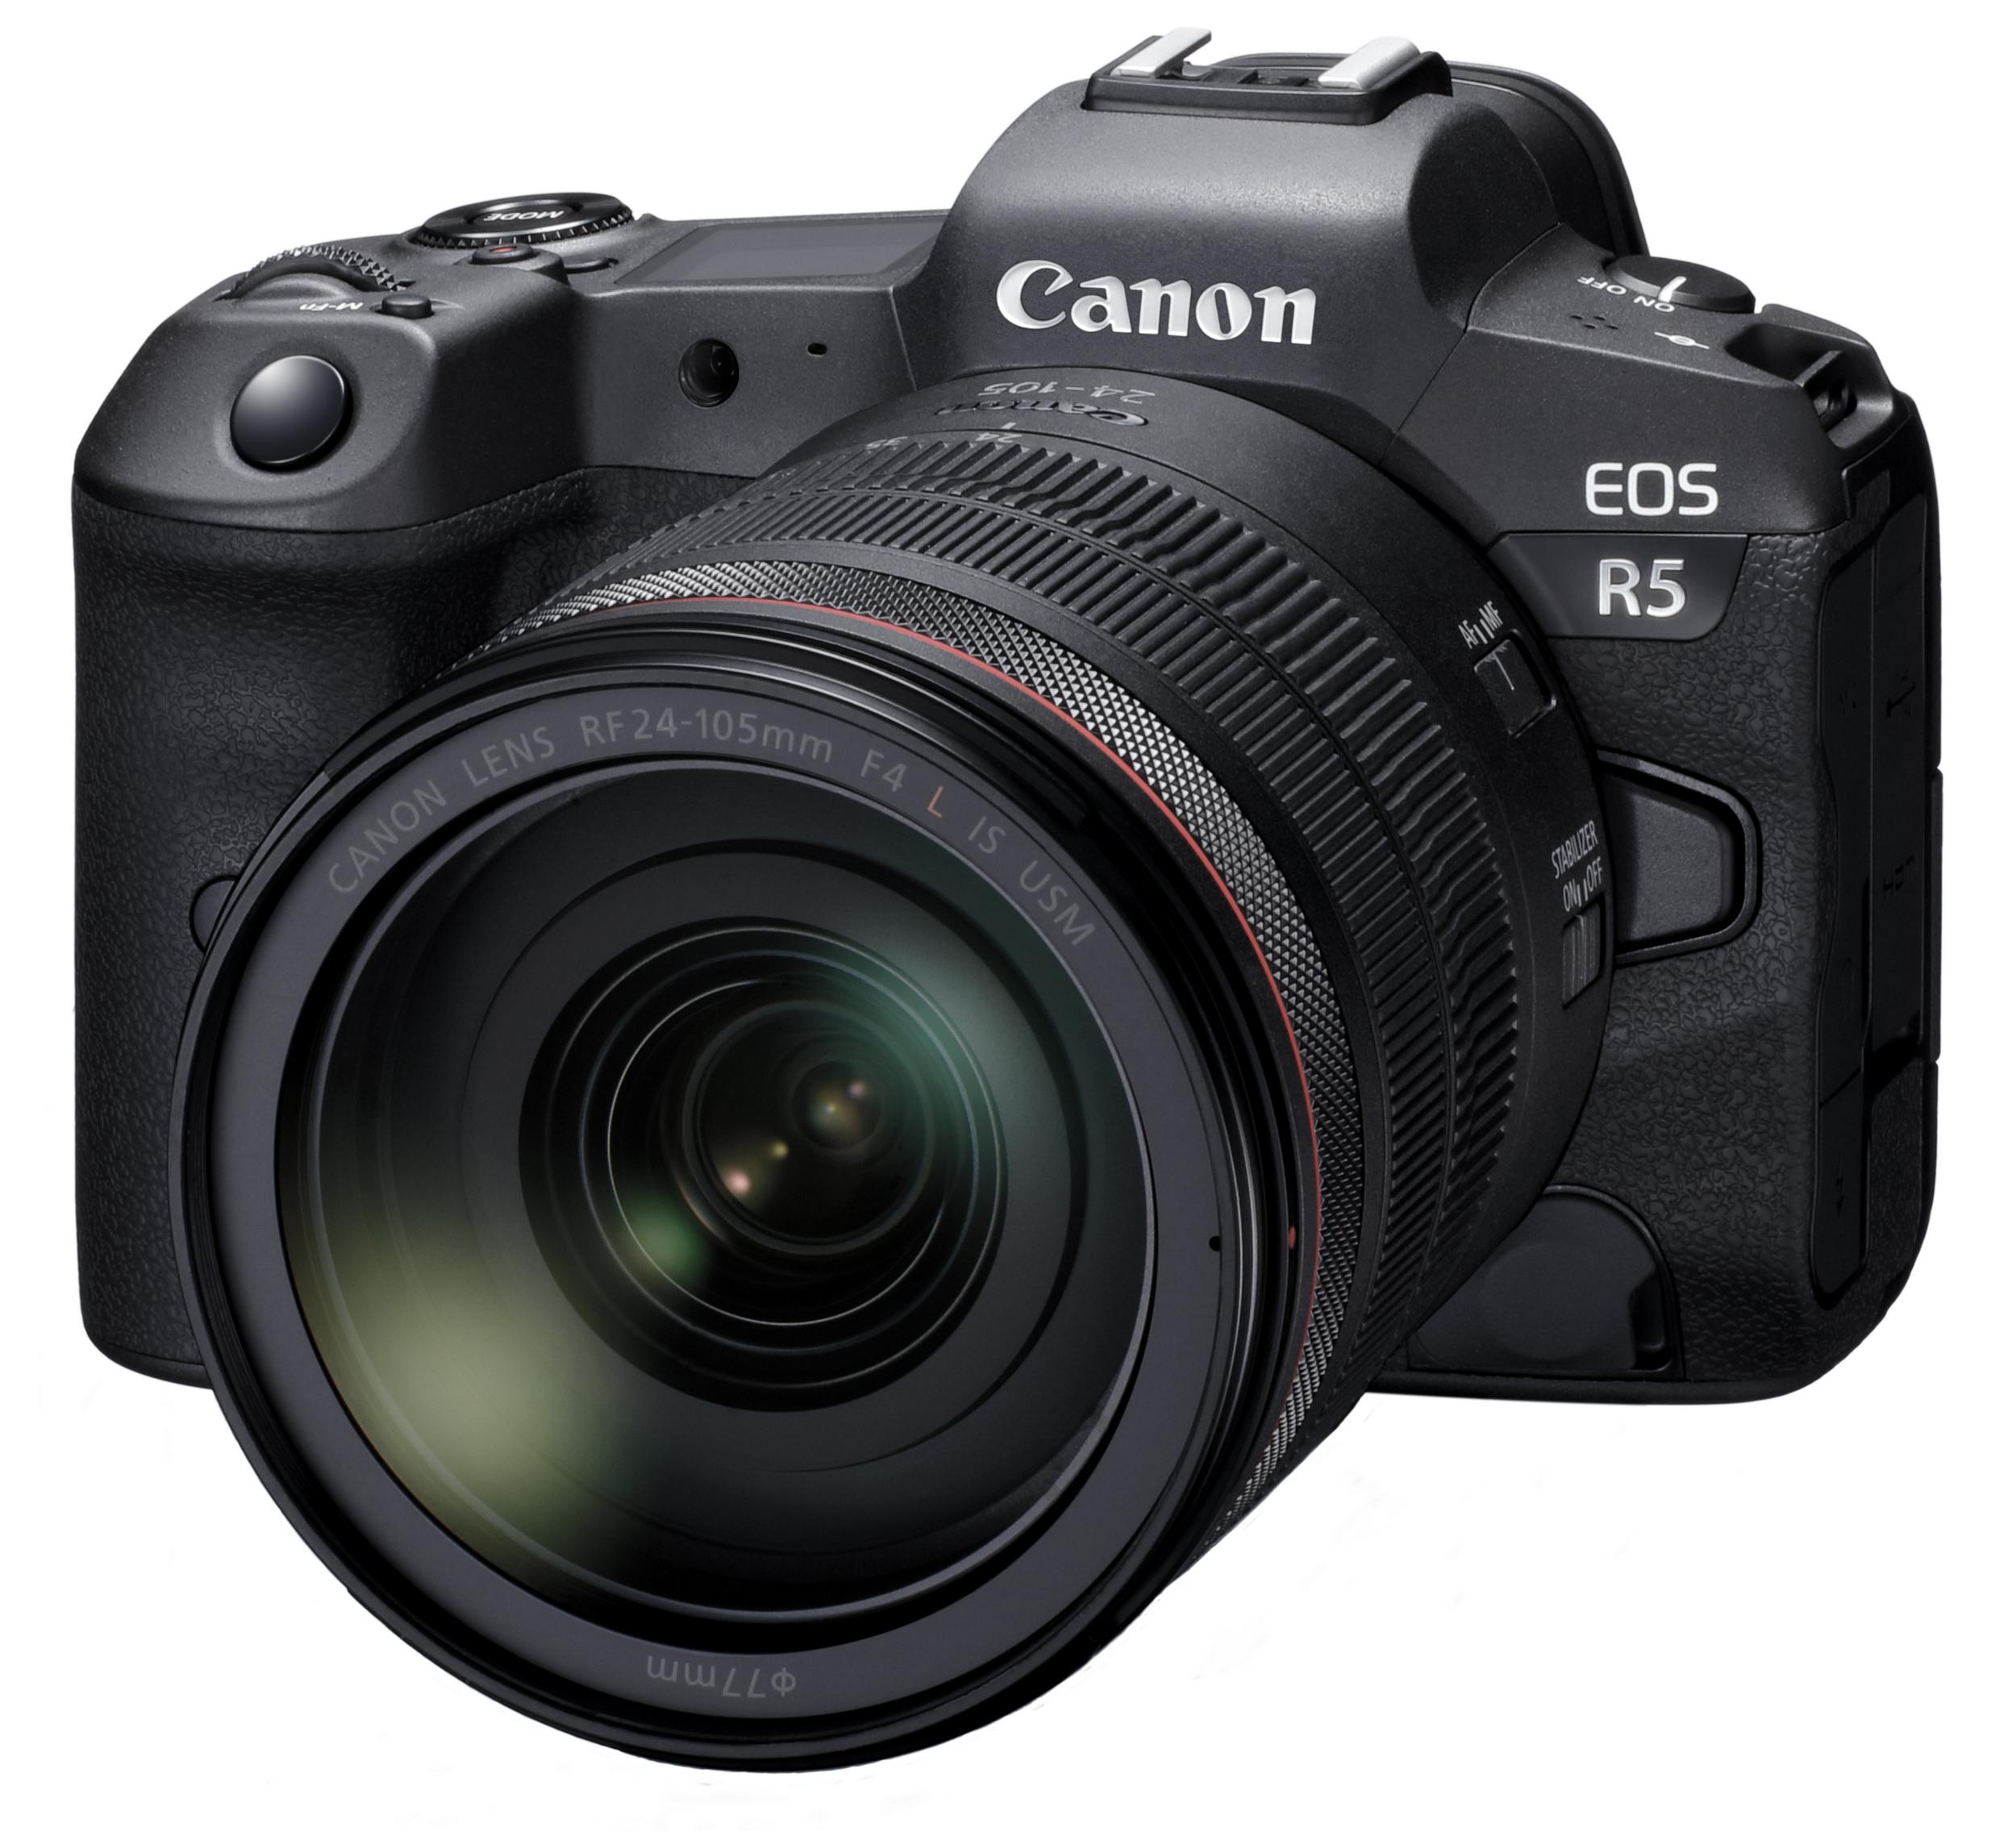 Canon announces new 70-200mm Compact Servo zoom lens